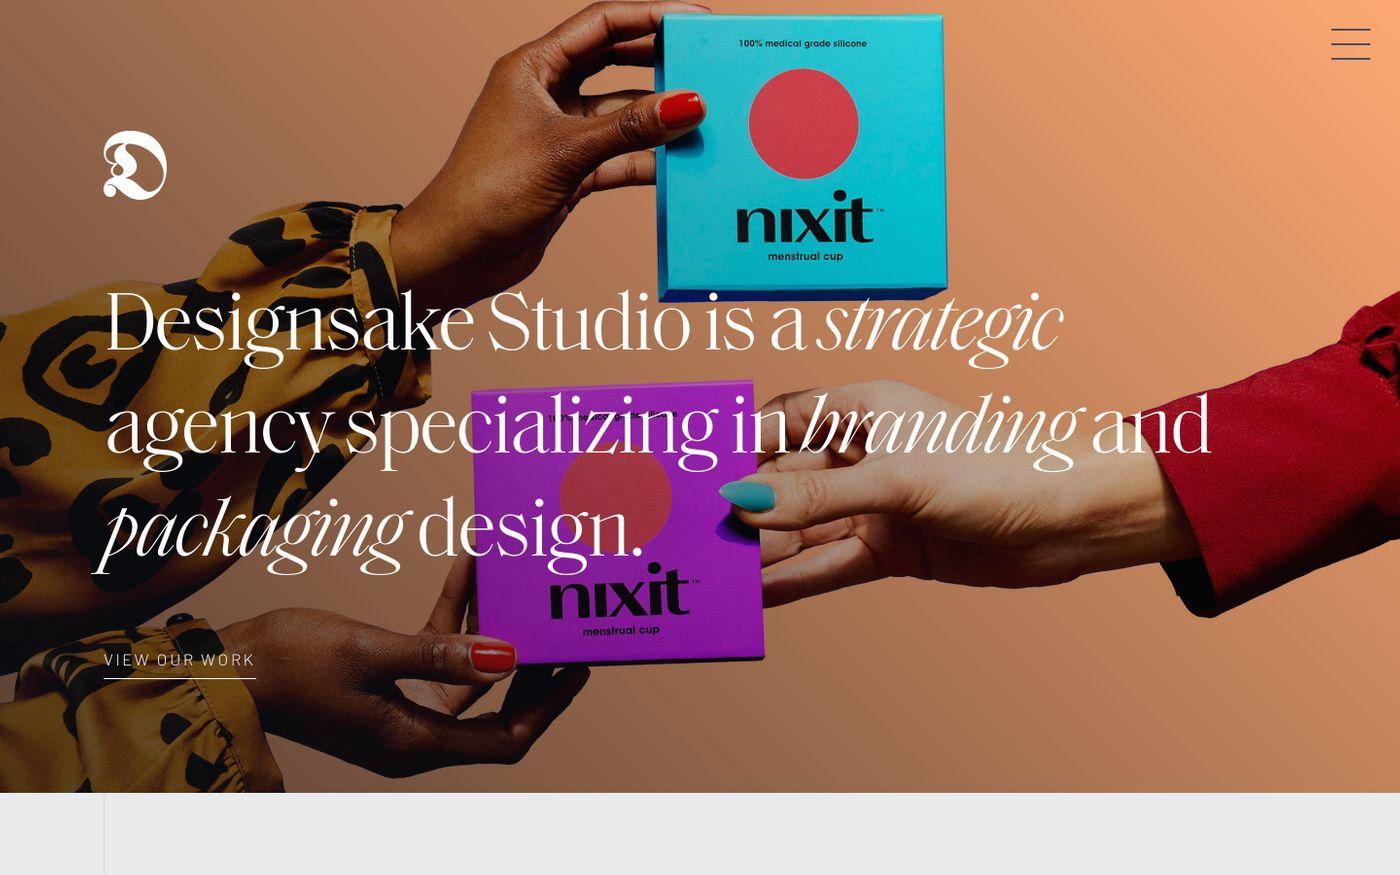 Screenshot of Designsake Studio website